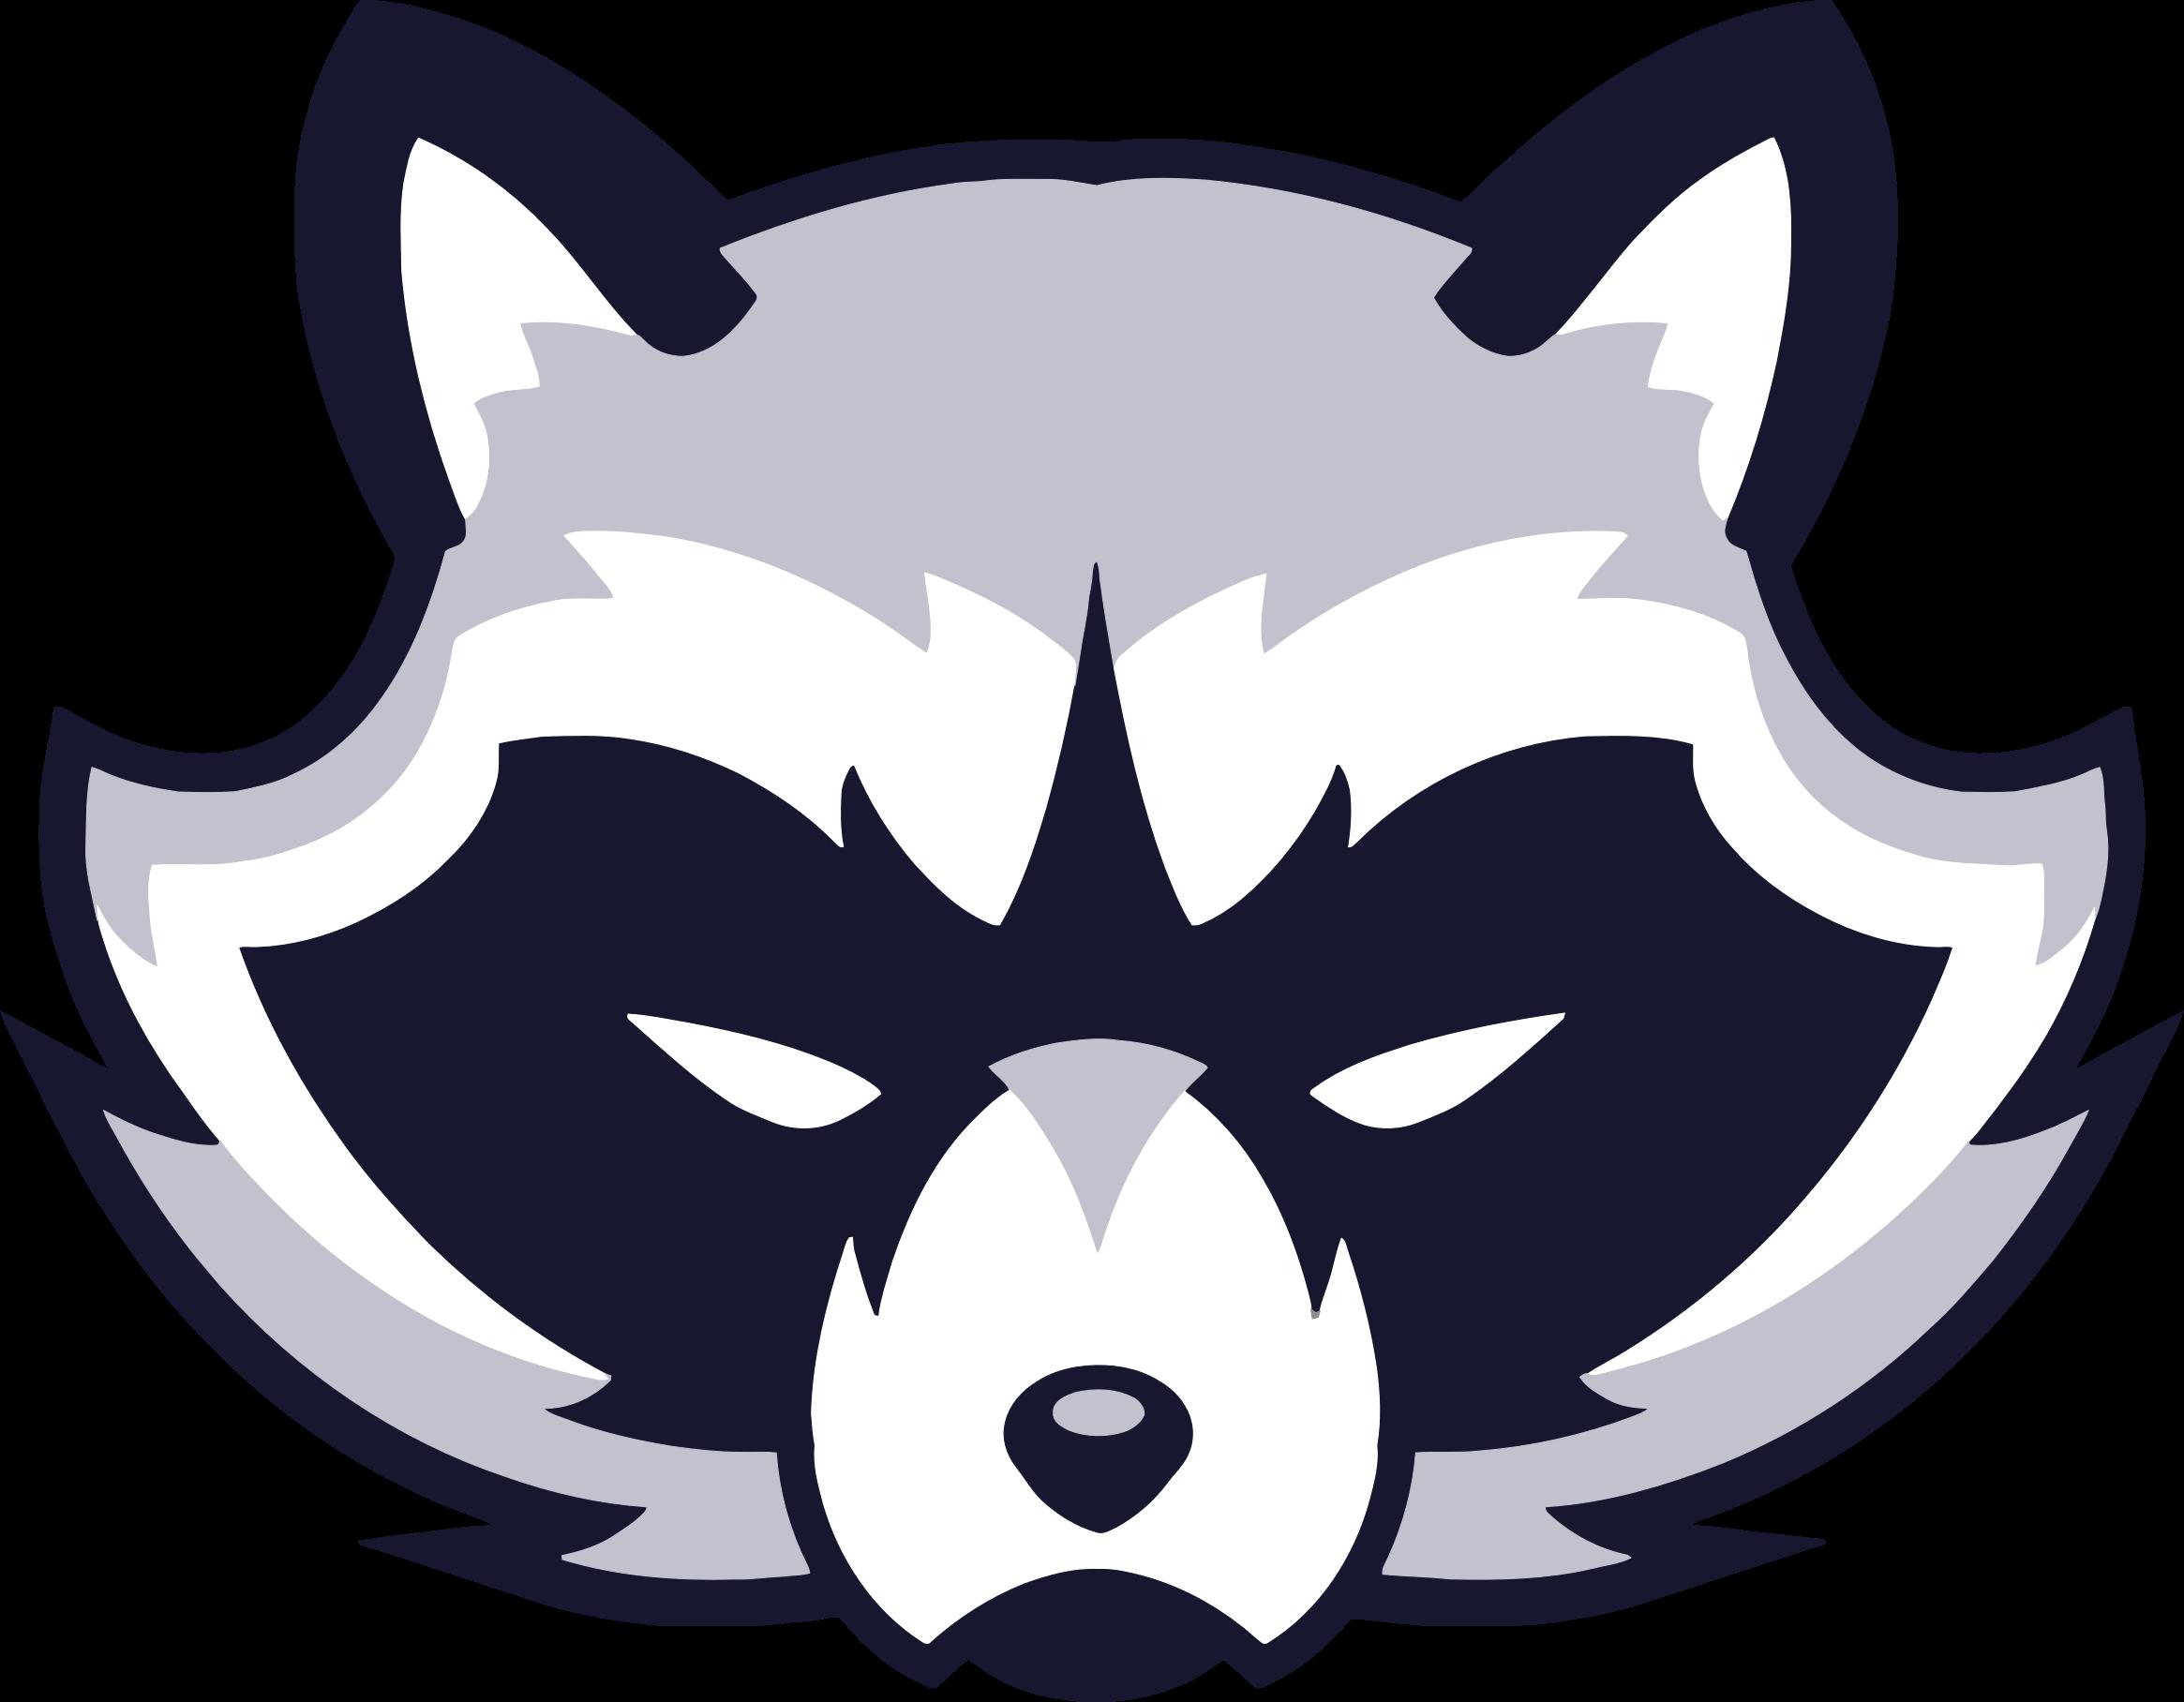 Raccoon Face Vector Clipart image - Free stock photo ... Raccoon Face Clip Art